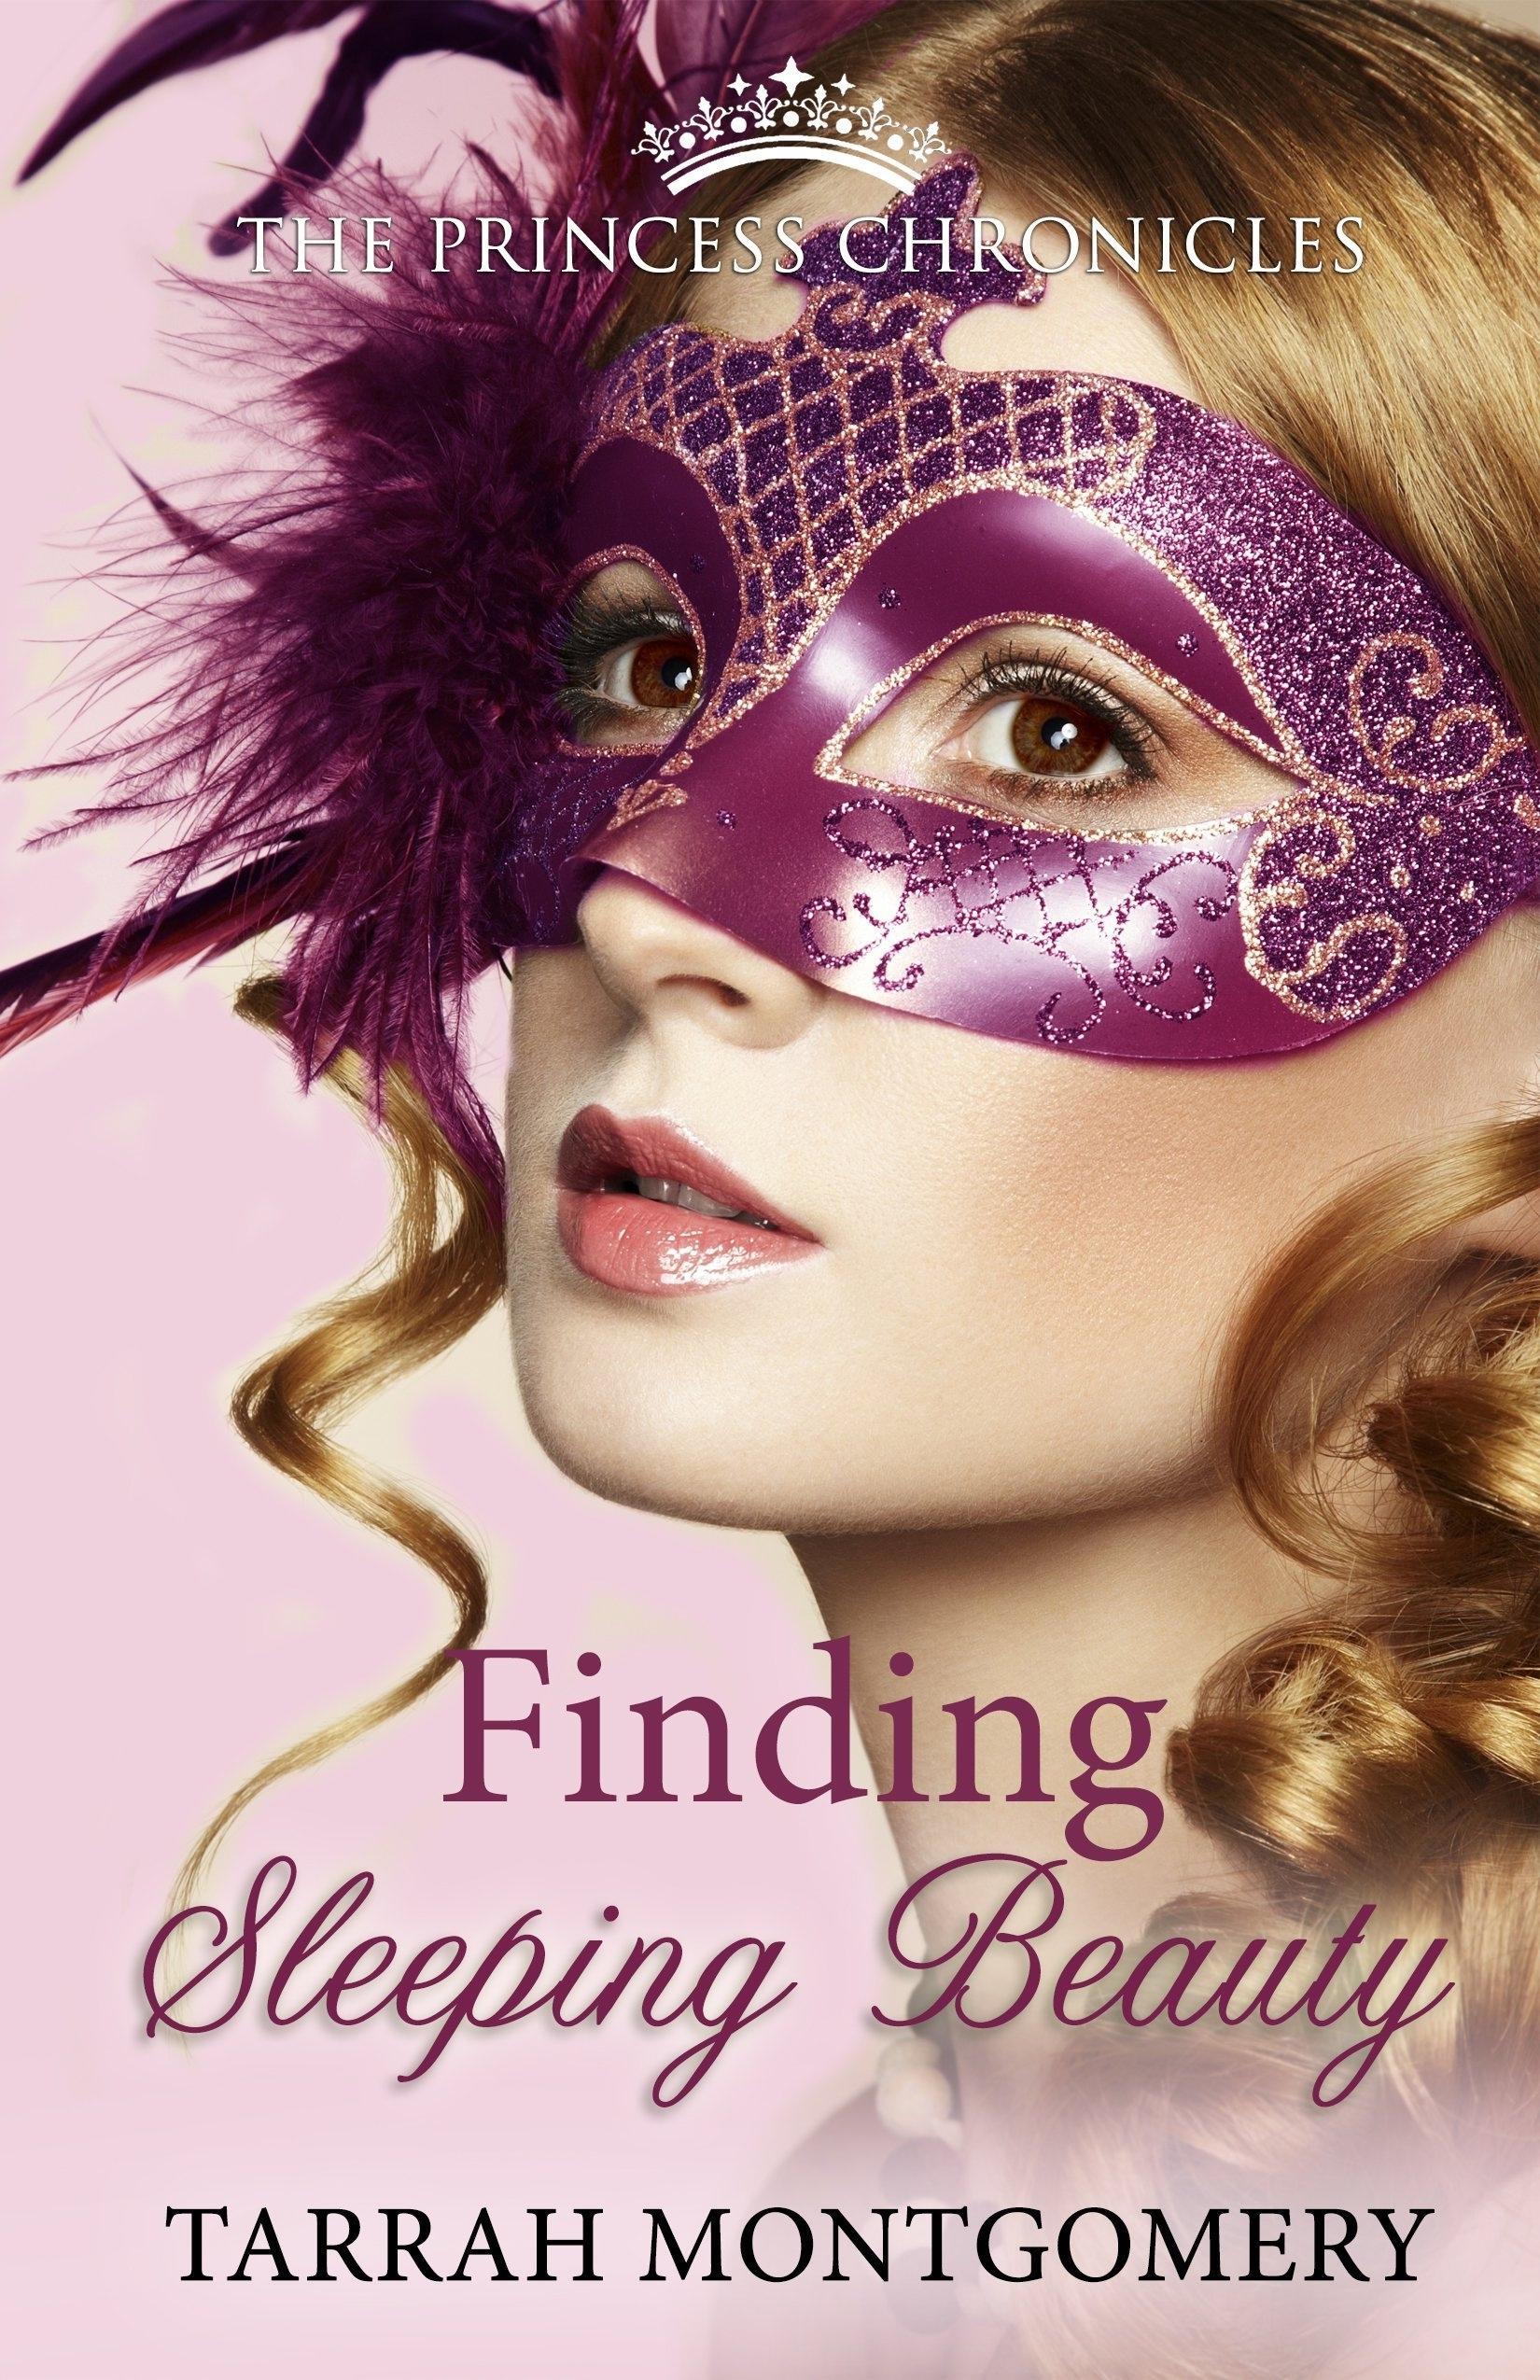 Finding Sleeping Beauty, Montgomery, Tarrah